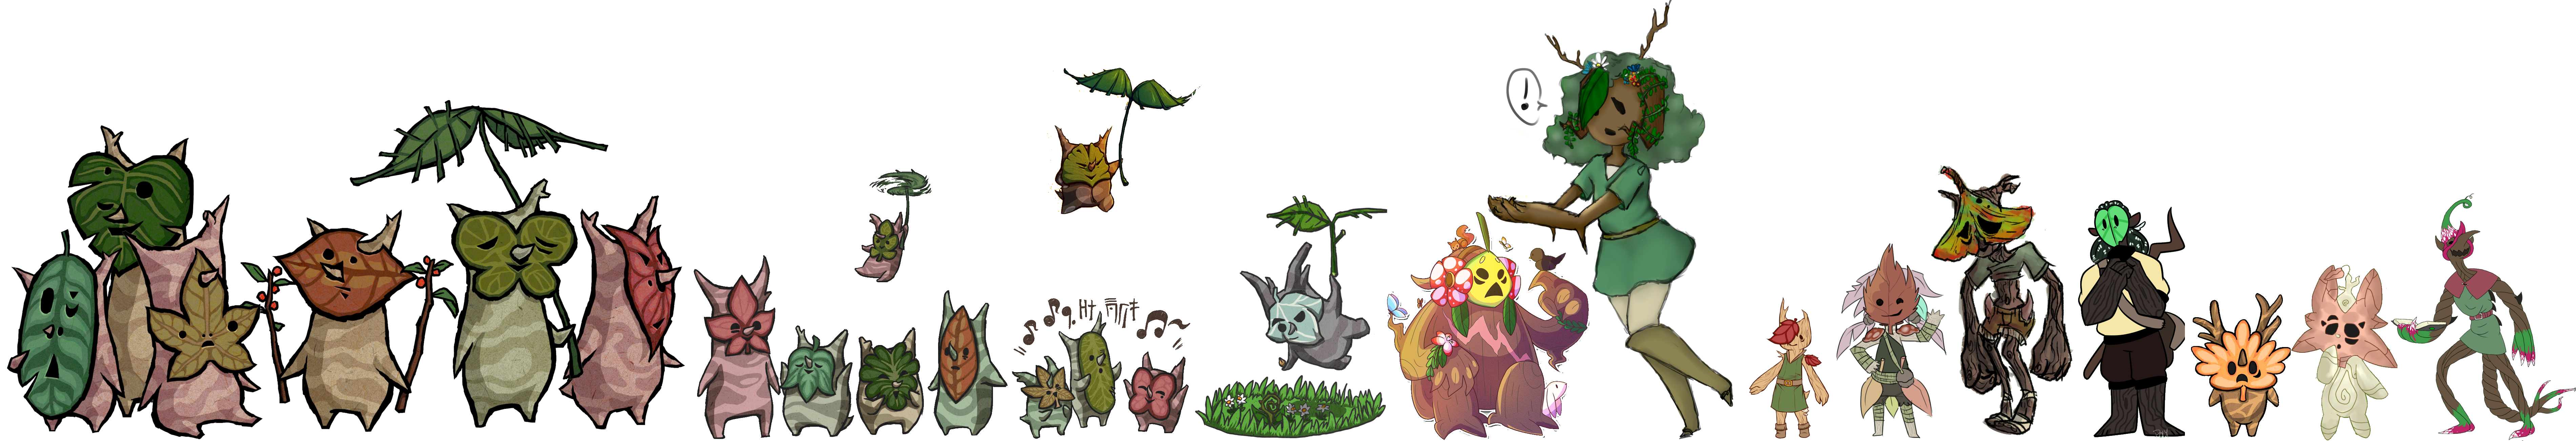 [CampagneS parallèles] Zelda LotR - 3*5 places LINEUPunscaledKOROK